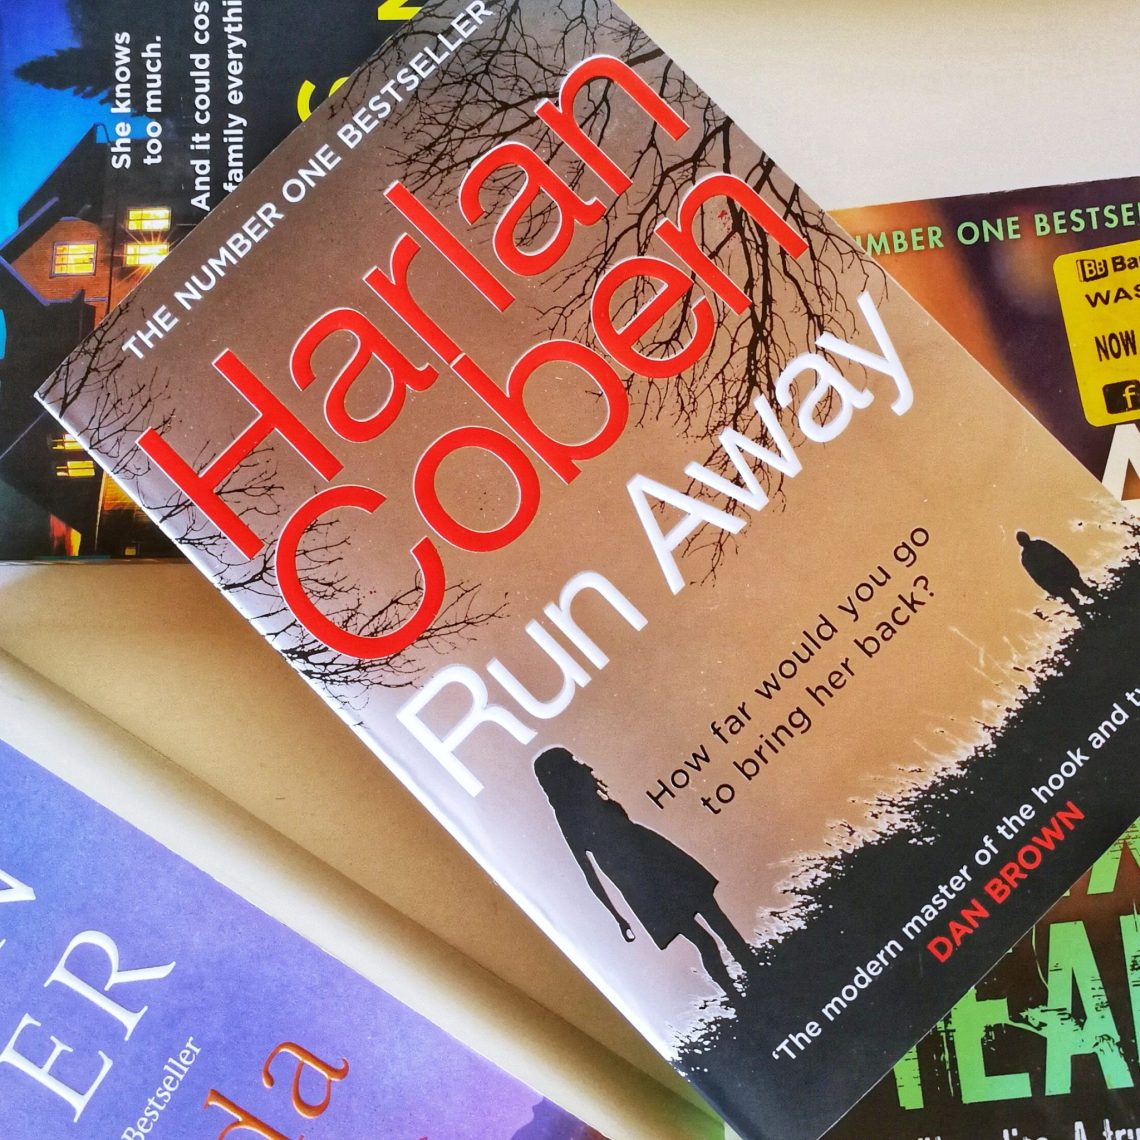 Book review Run Away by Harlan Coben